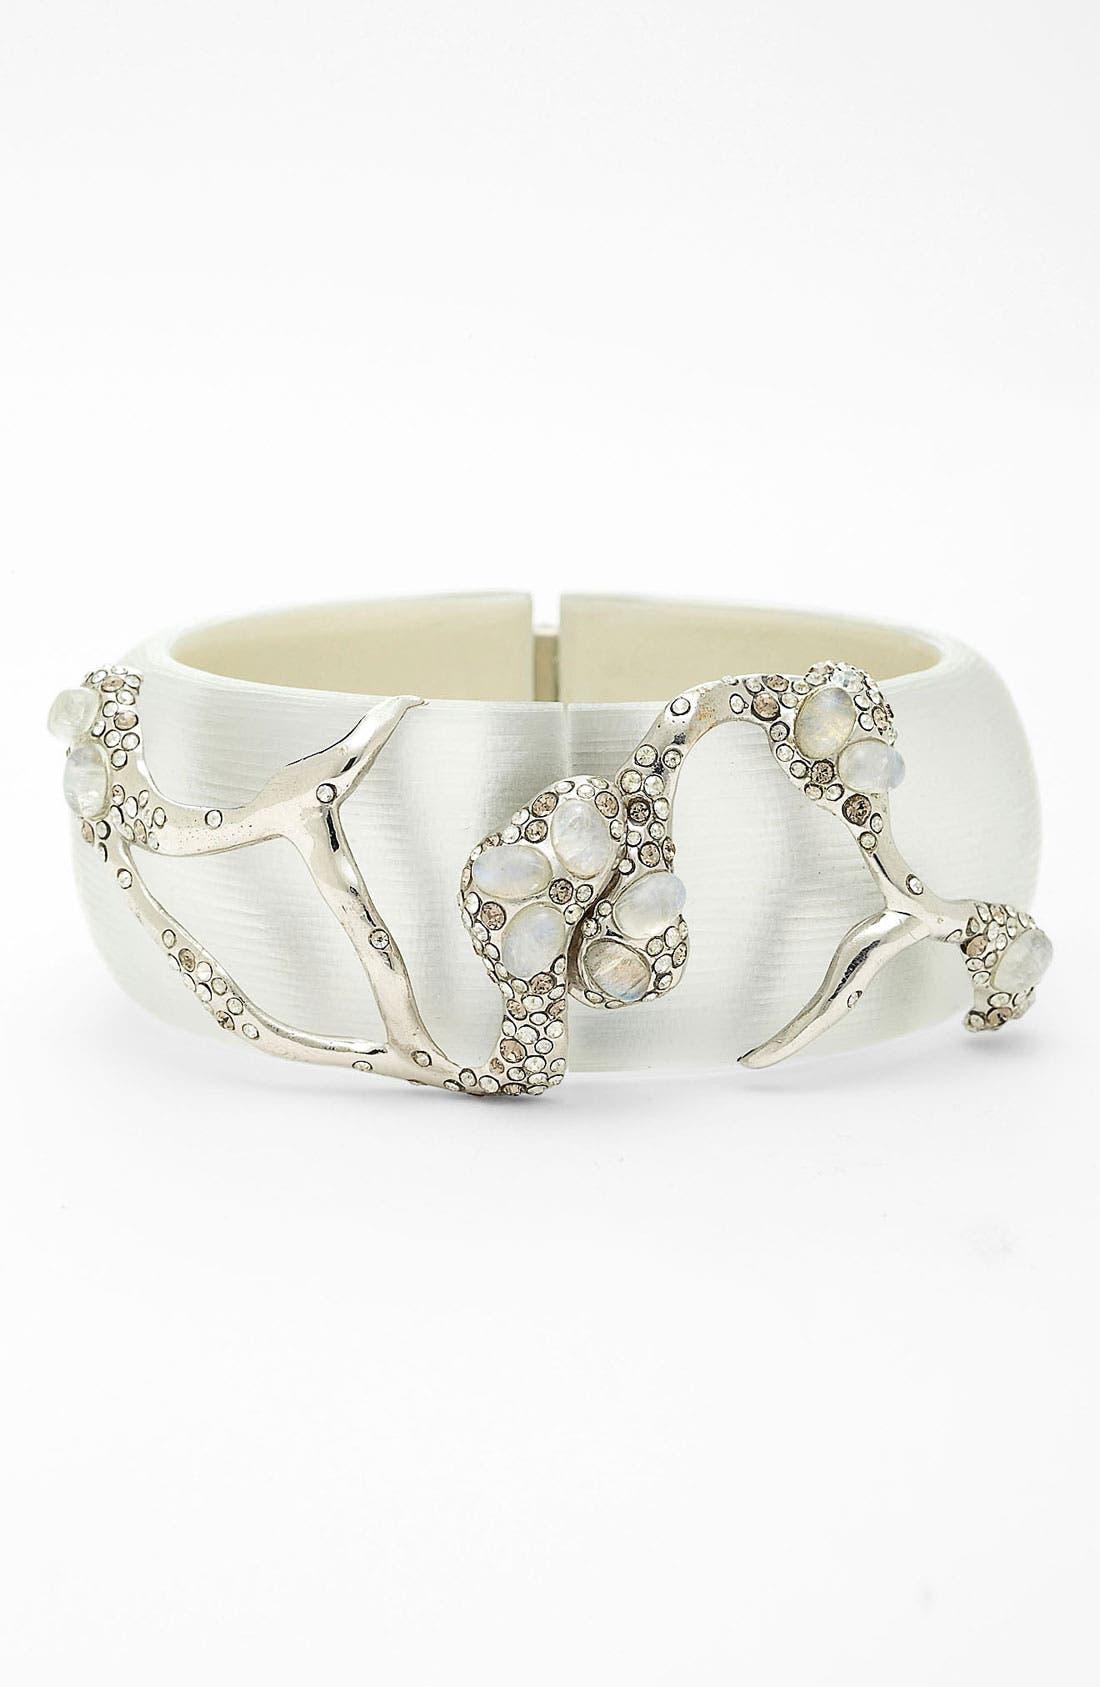 Main Image - Alexis Bittar 'Modernist - Embraced' Hinged Bracelet (Nordstrom Exclusive)